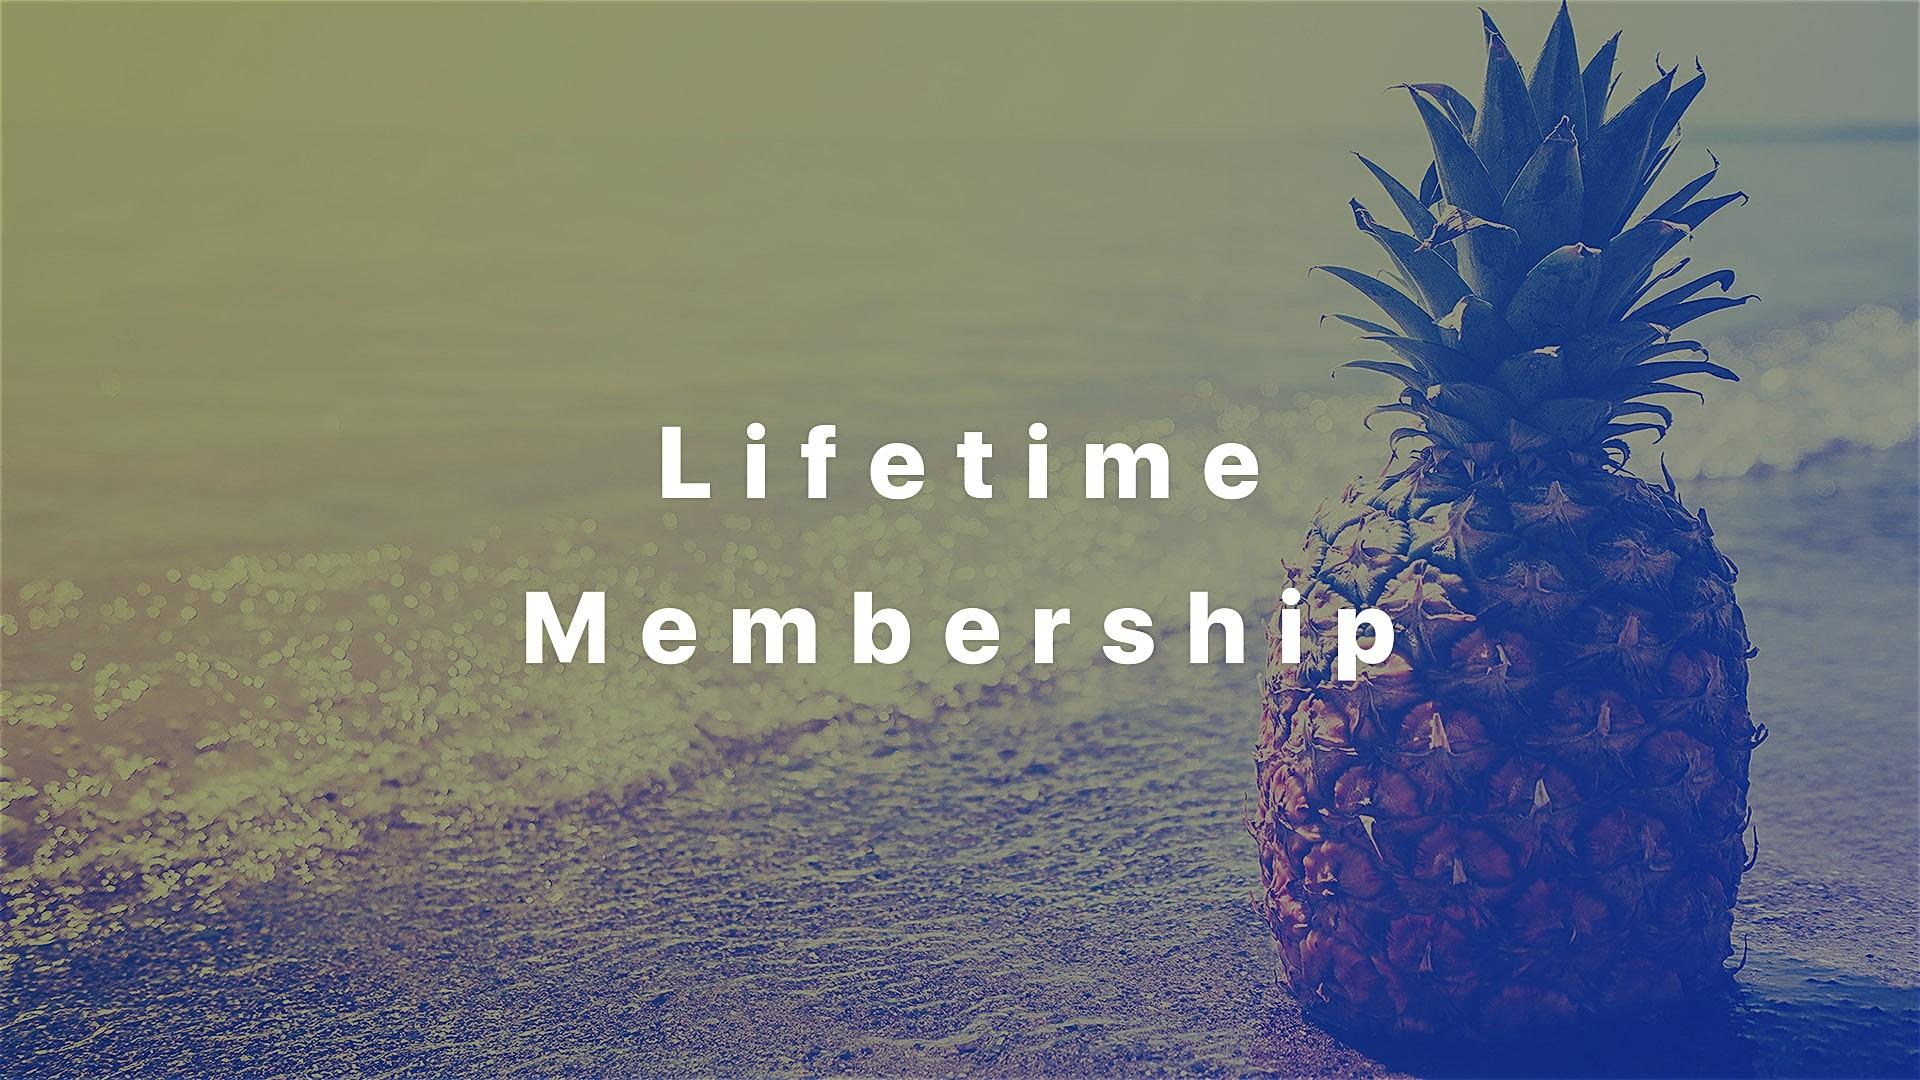 Res: 1920x1080, Lifetime Membership